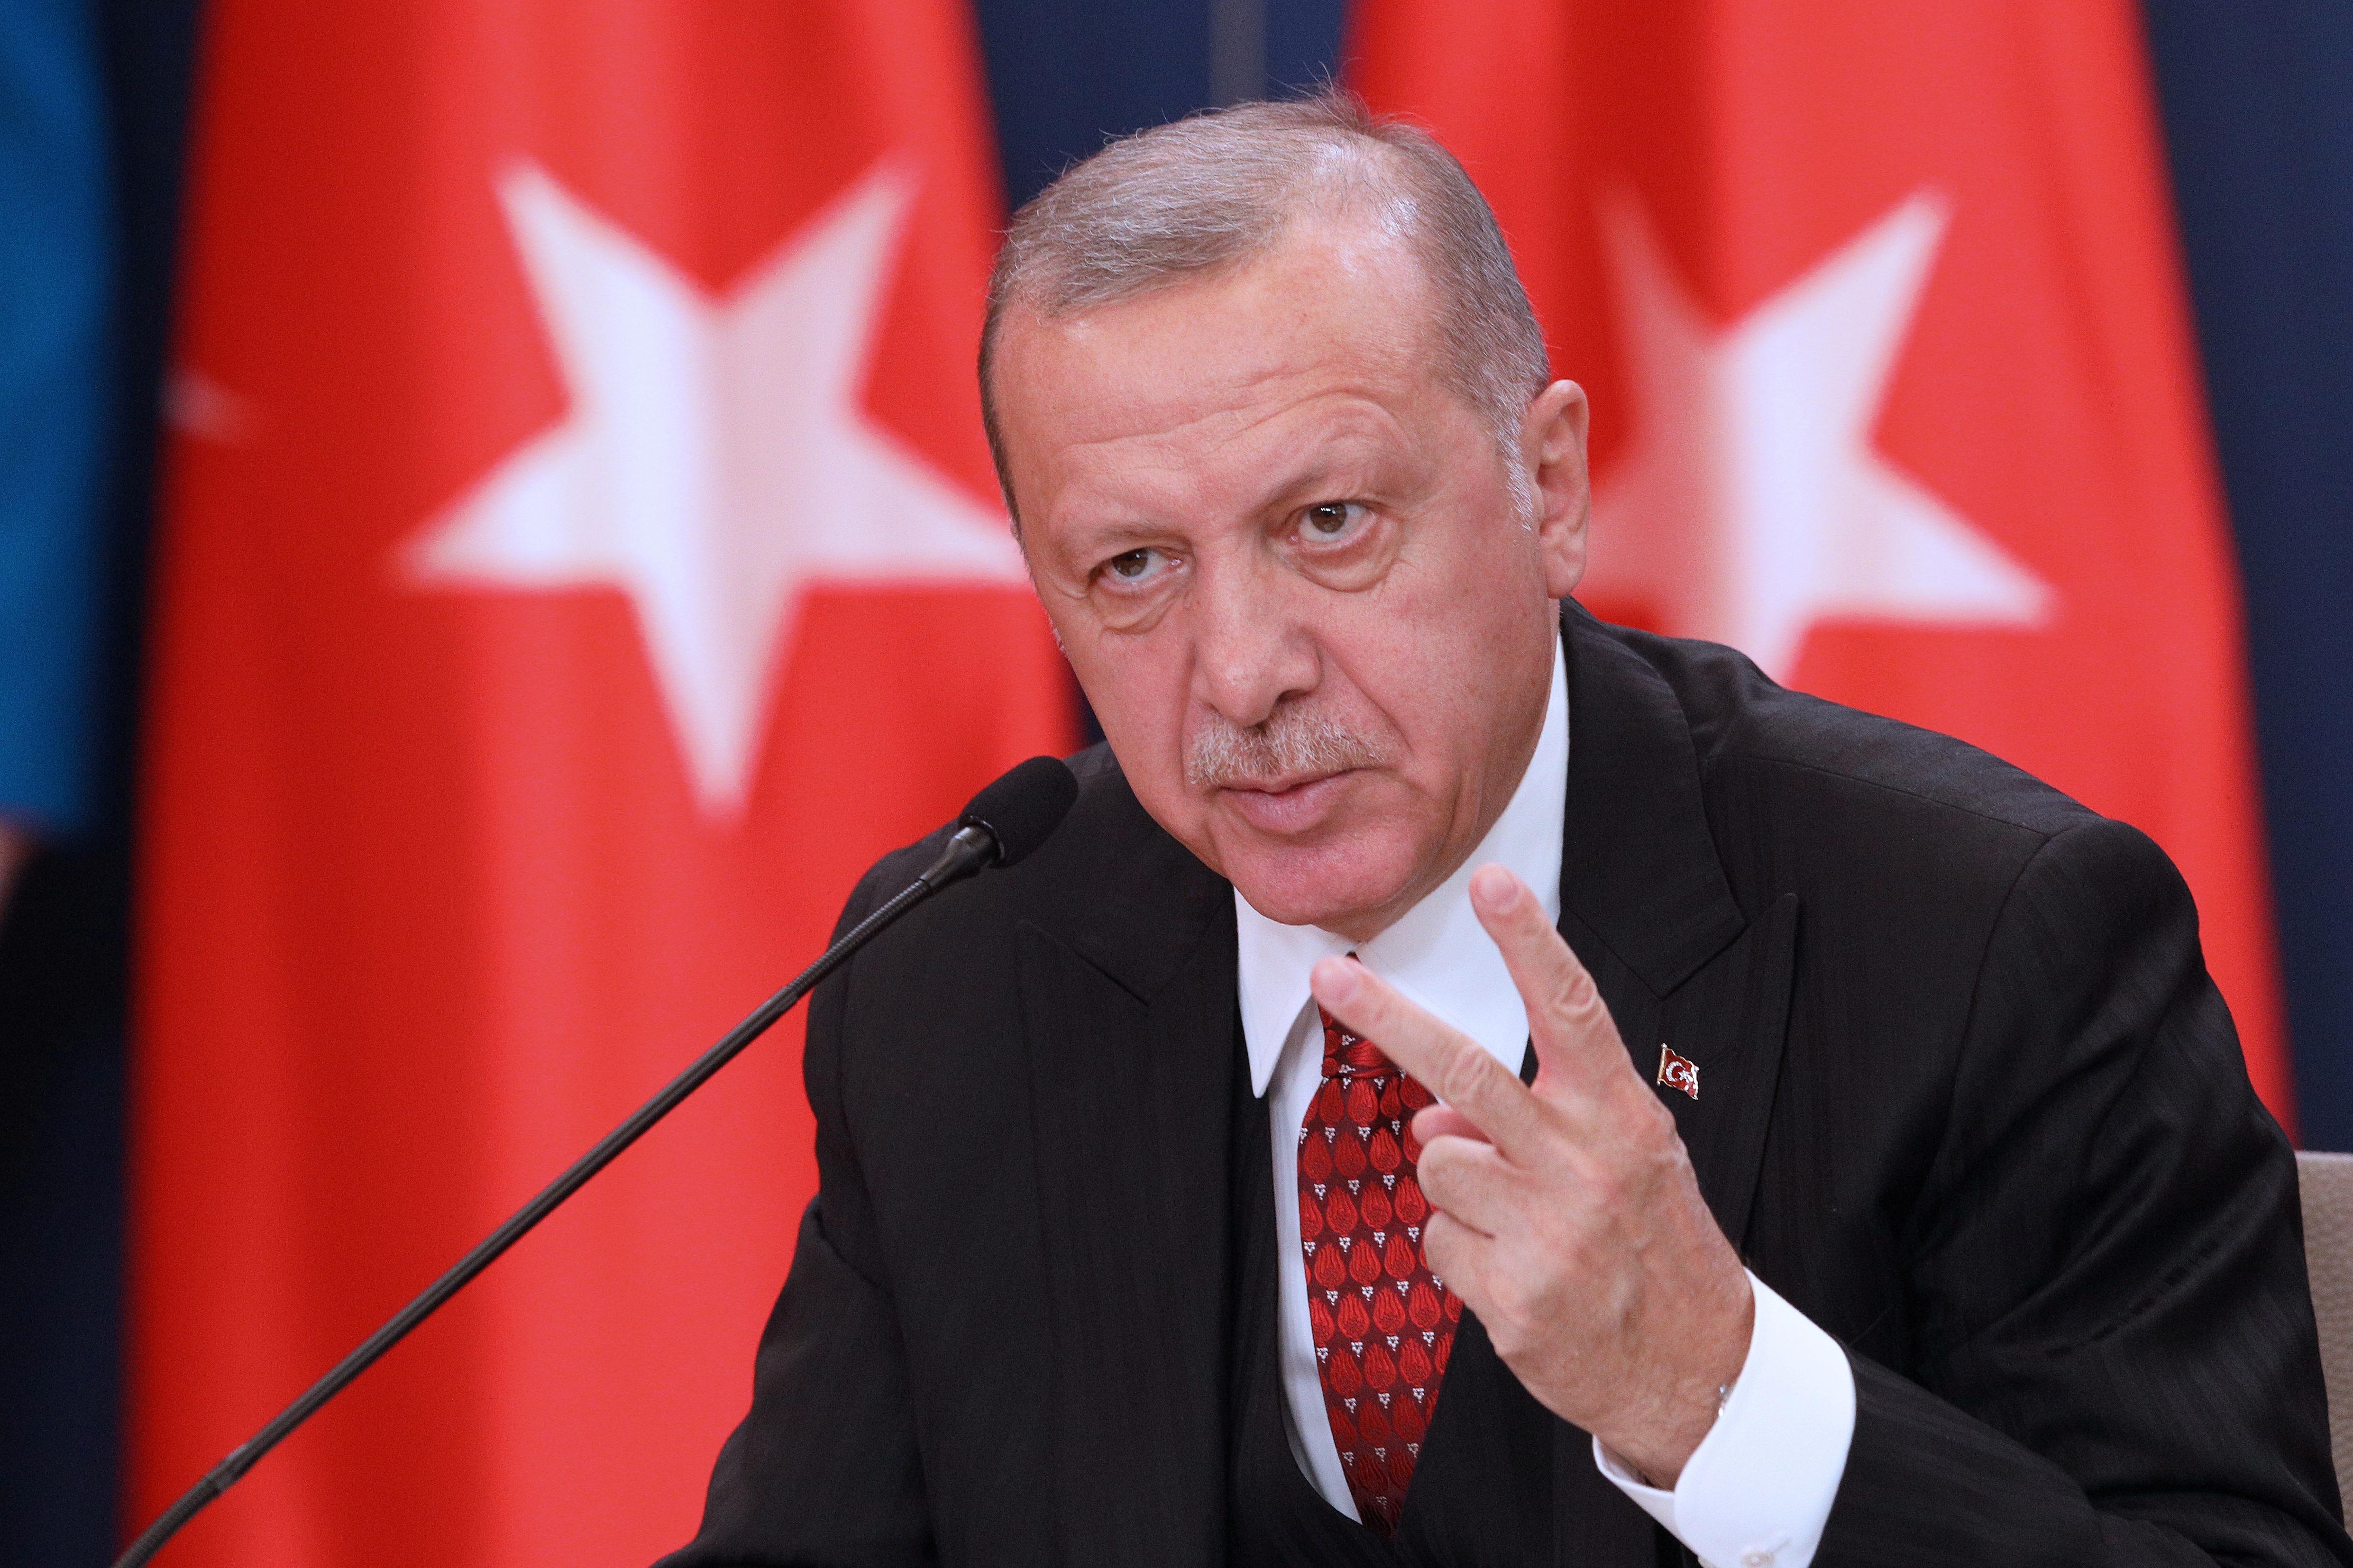 Turkey's Erdogan says alternatives to F-35 jets ready, receiving...